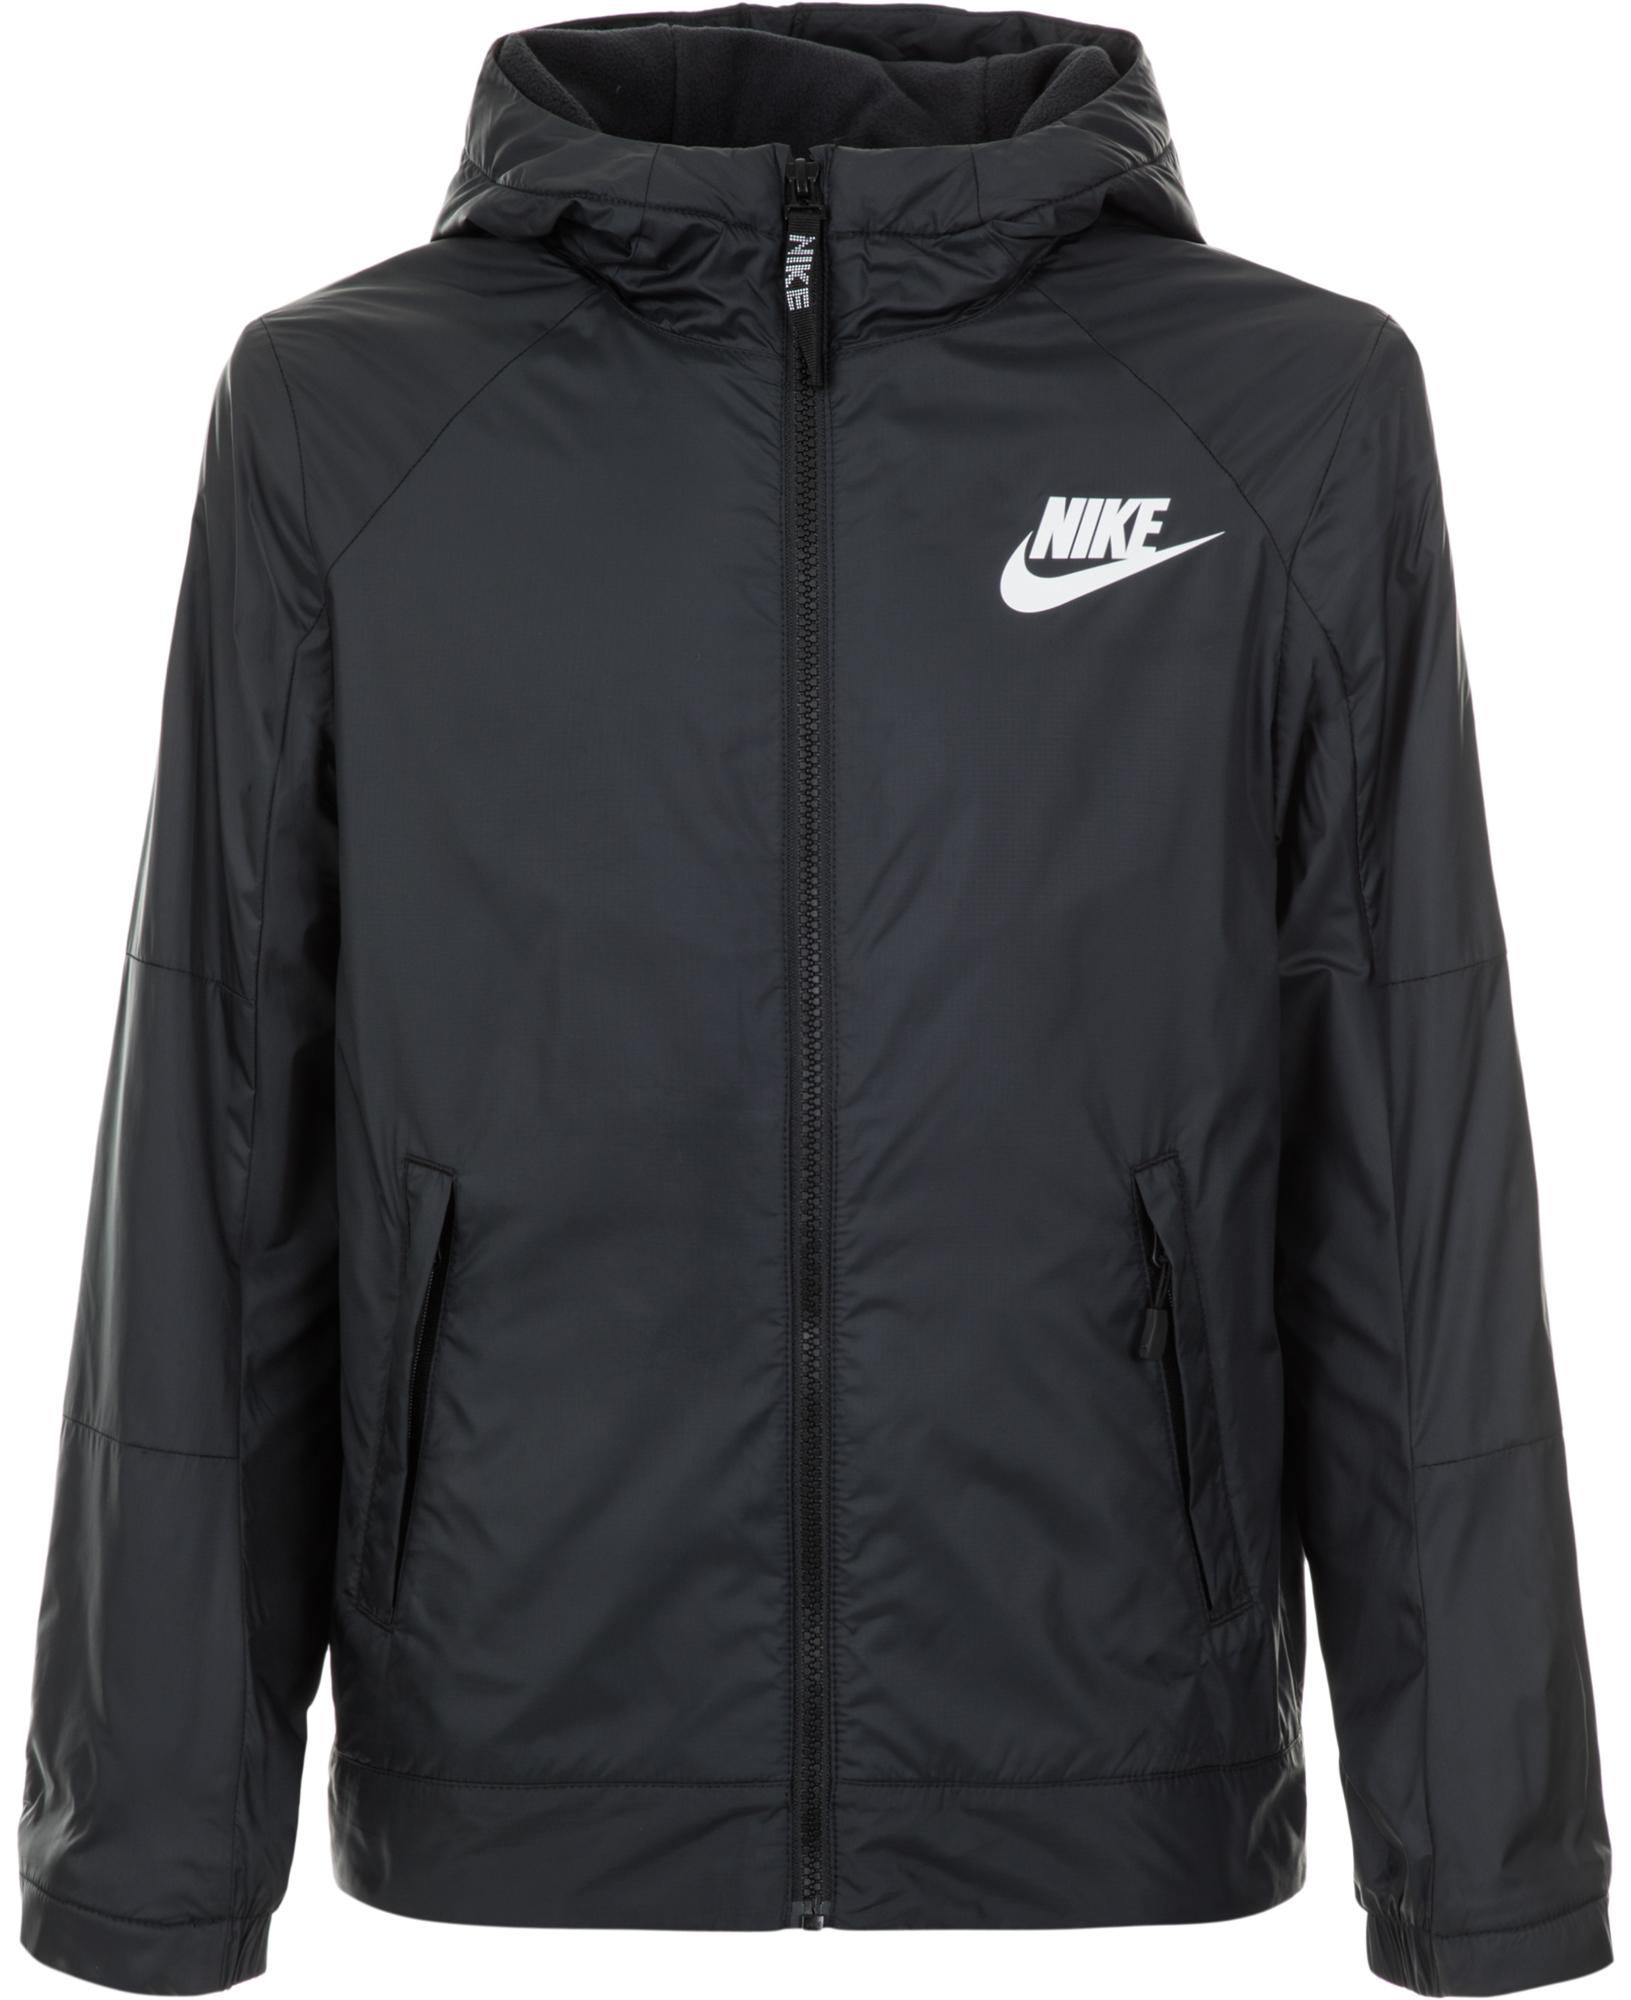 Nike Куртка утепленная для мальчиков Sportswear, размер 158-170